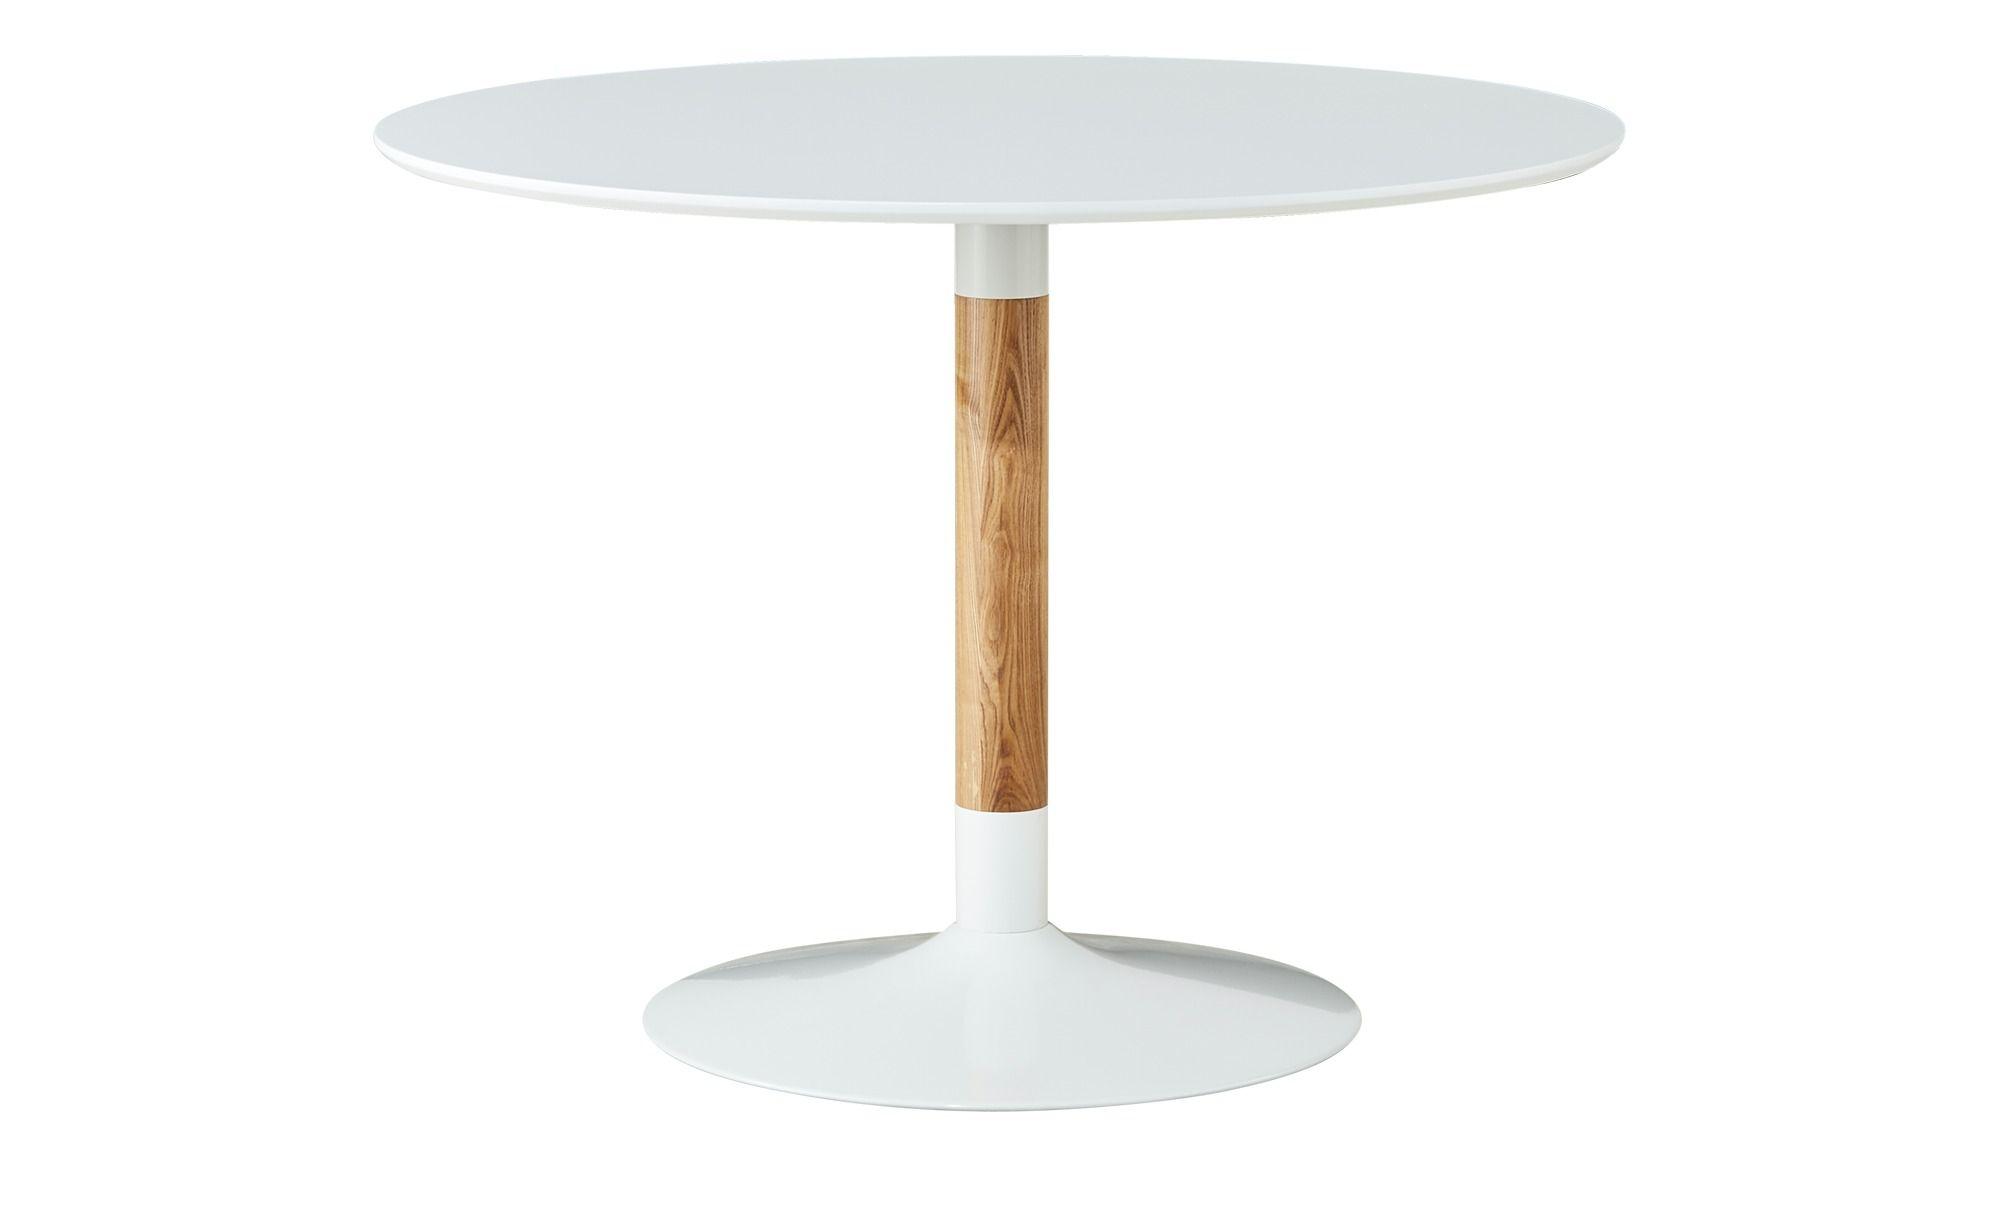 Esstisch Sylvester Tisch Esstisch Esstisch Weiss